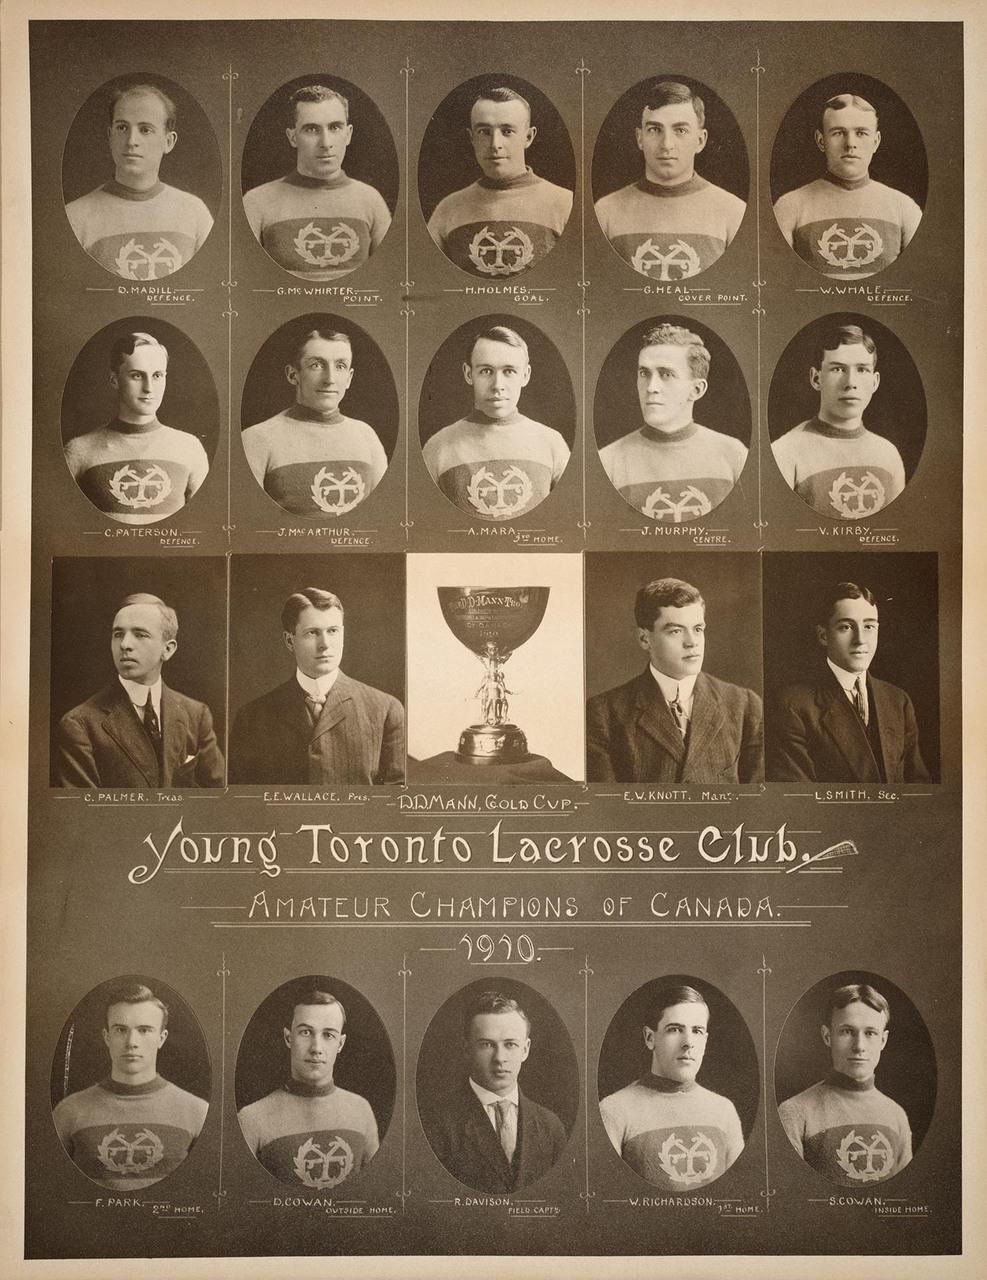 Young Toronto Lacrosse Club